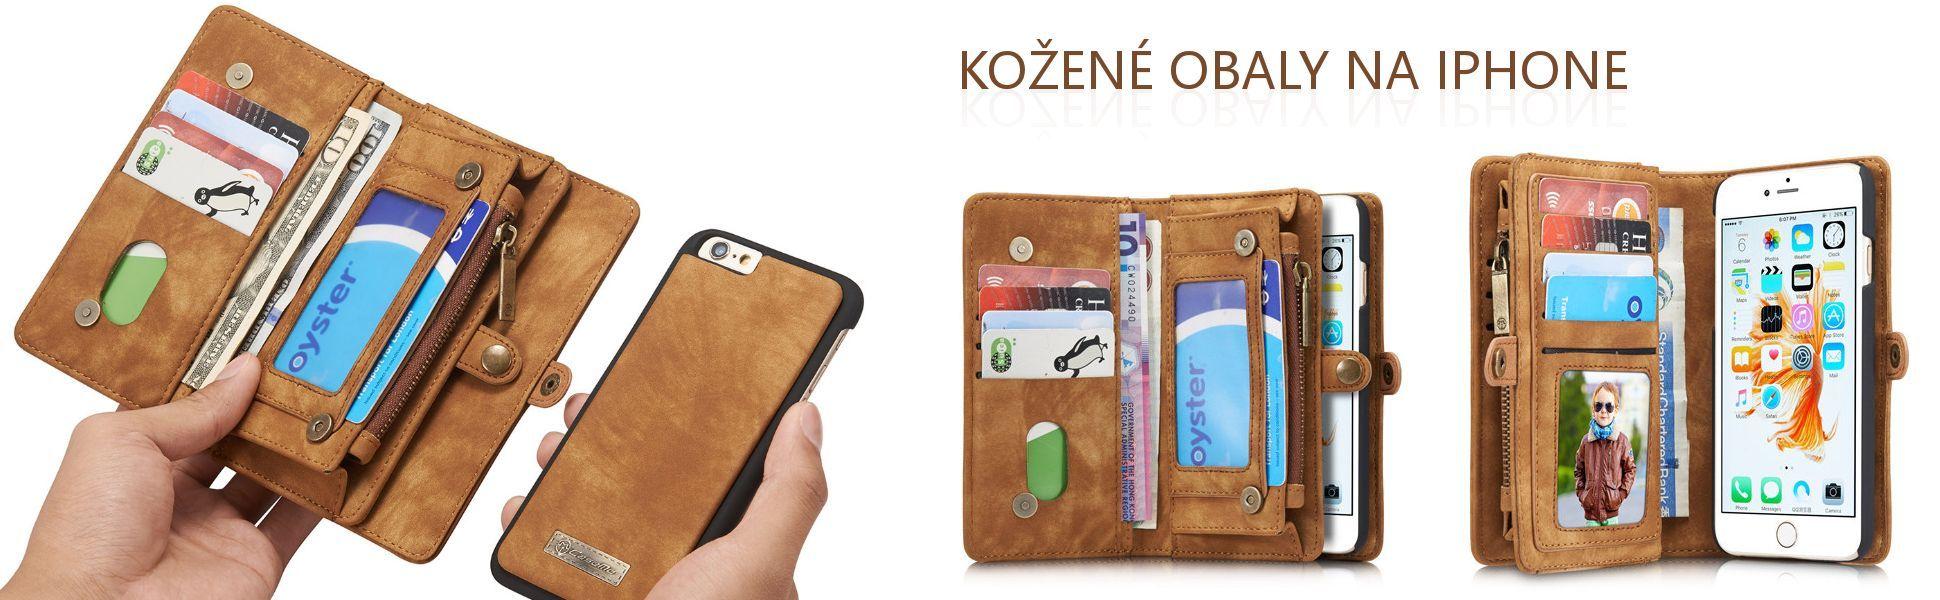 Luxusne kozene obaly na iPhone, puzdra pre iphone, APPLE IPHONE